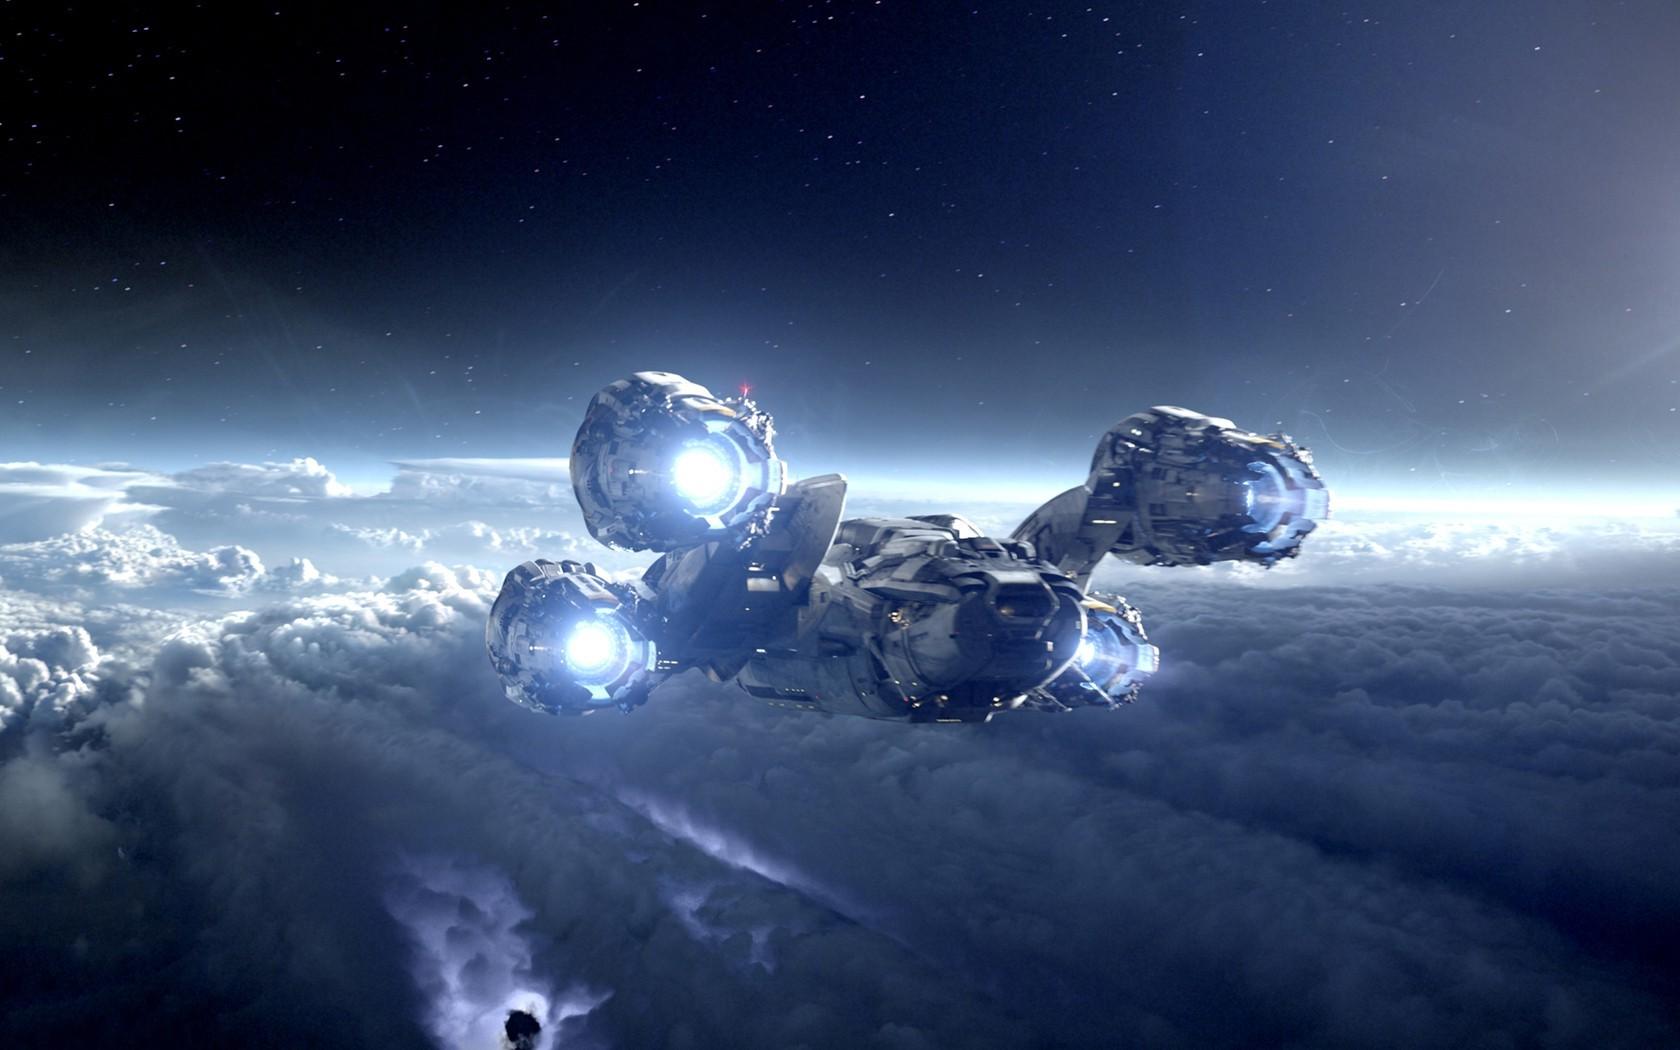 Wallpaper night planet vehicle earth spaceship - Spaceship wallpaper ...